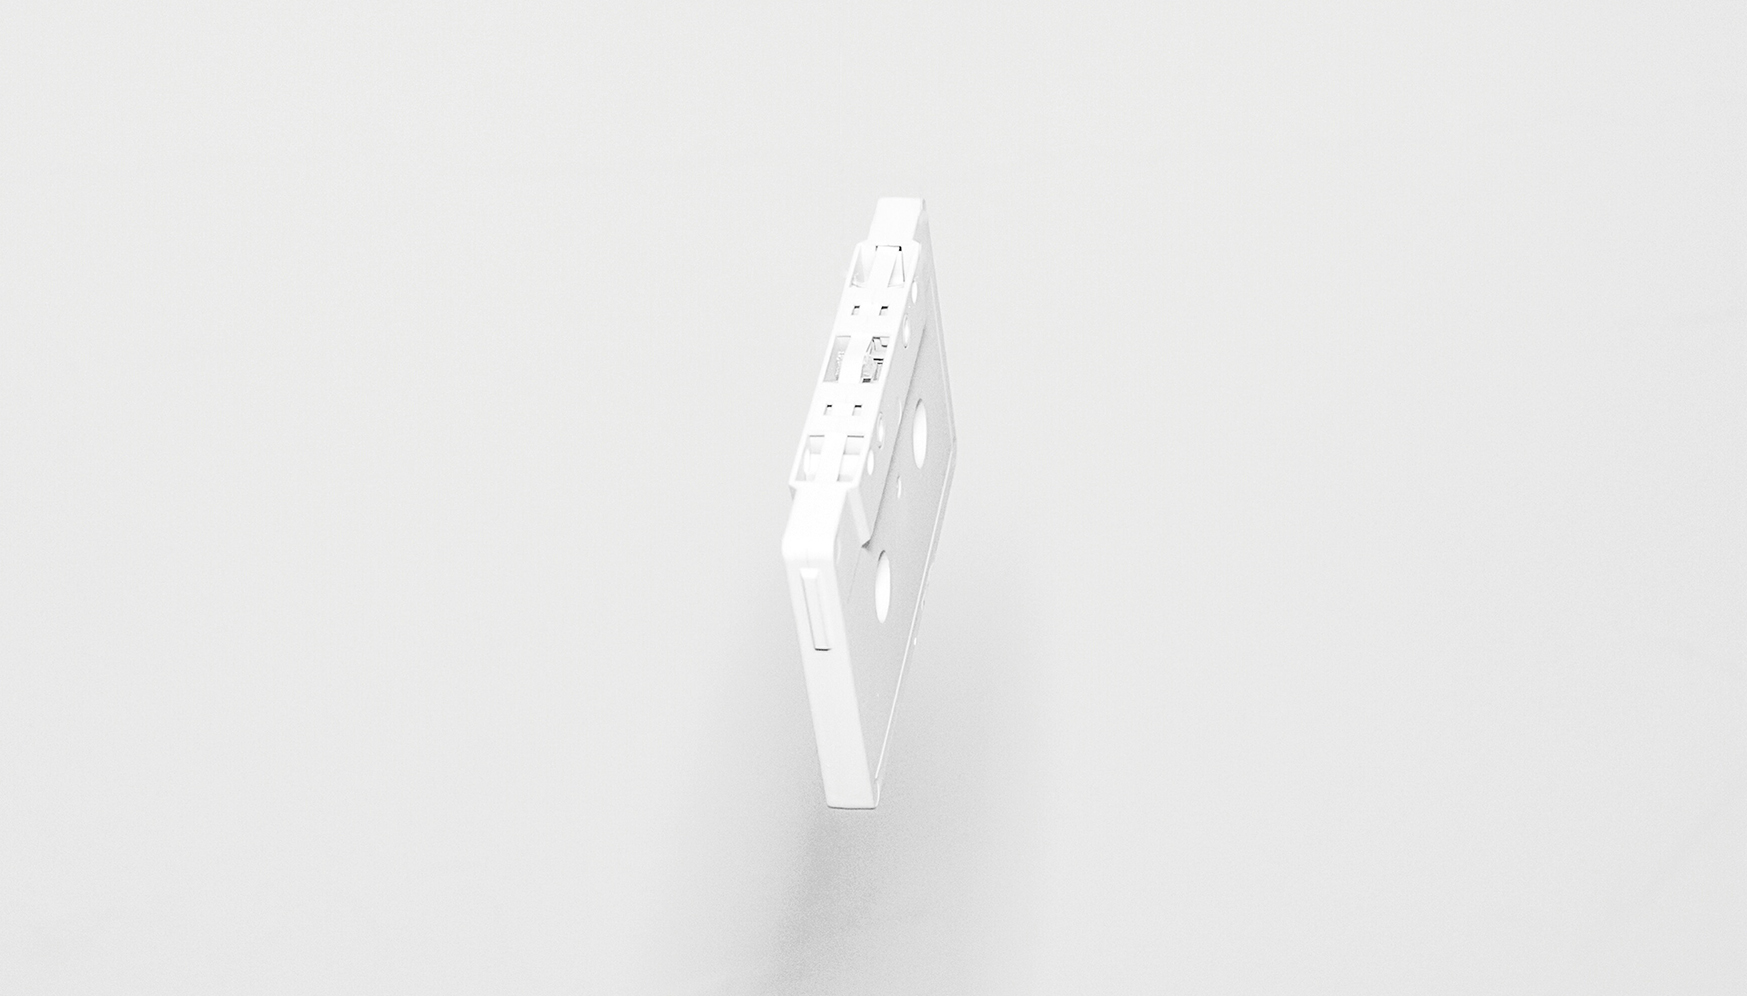 uso de la musica